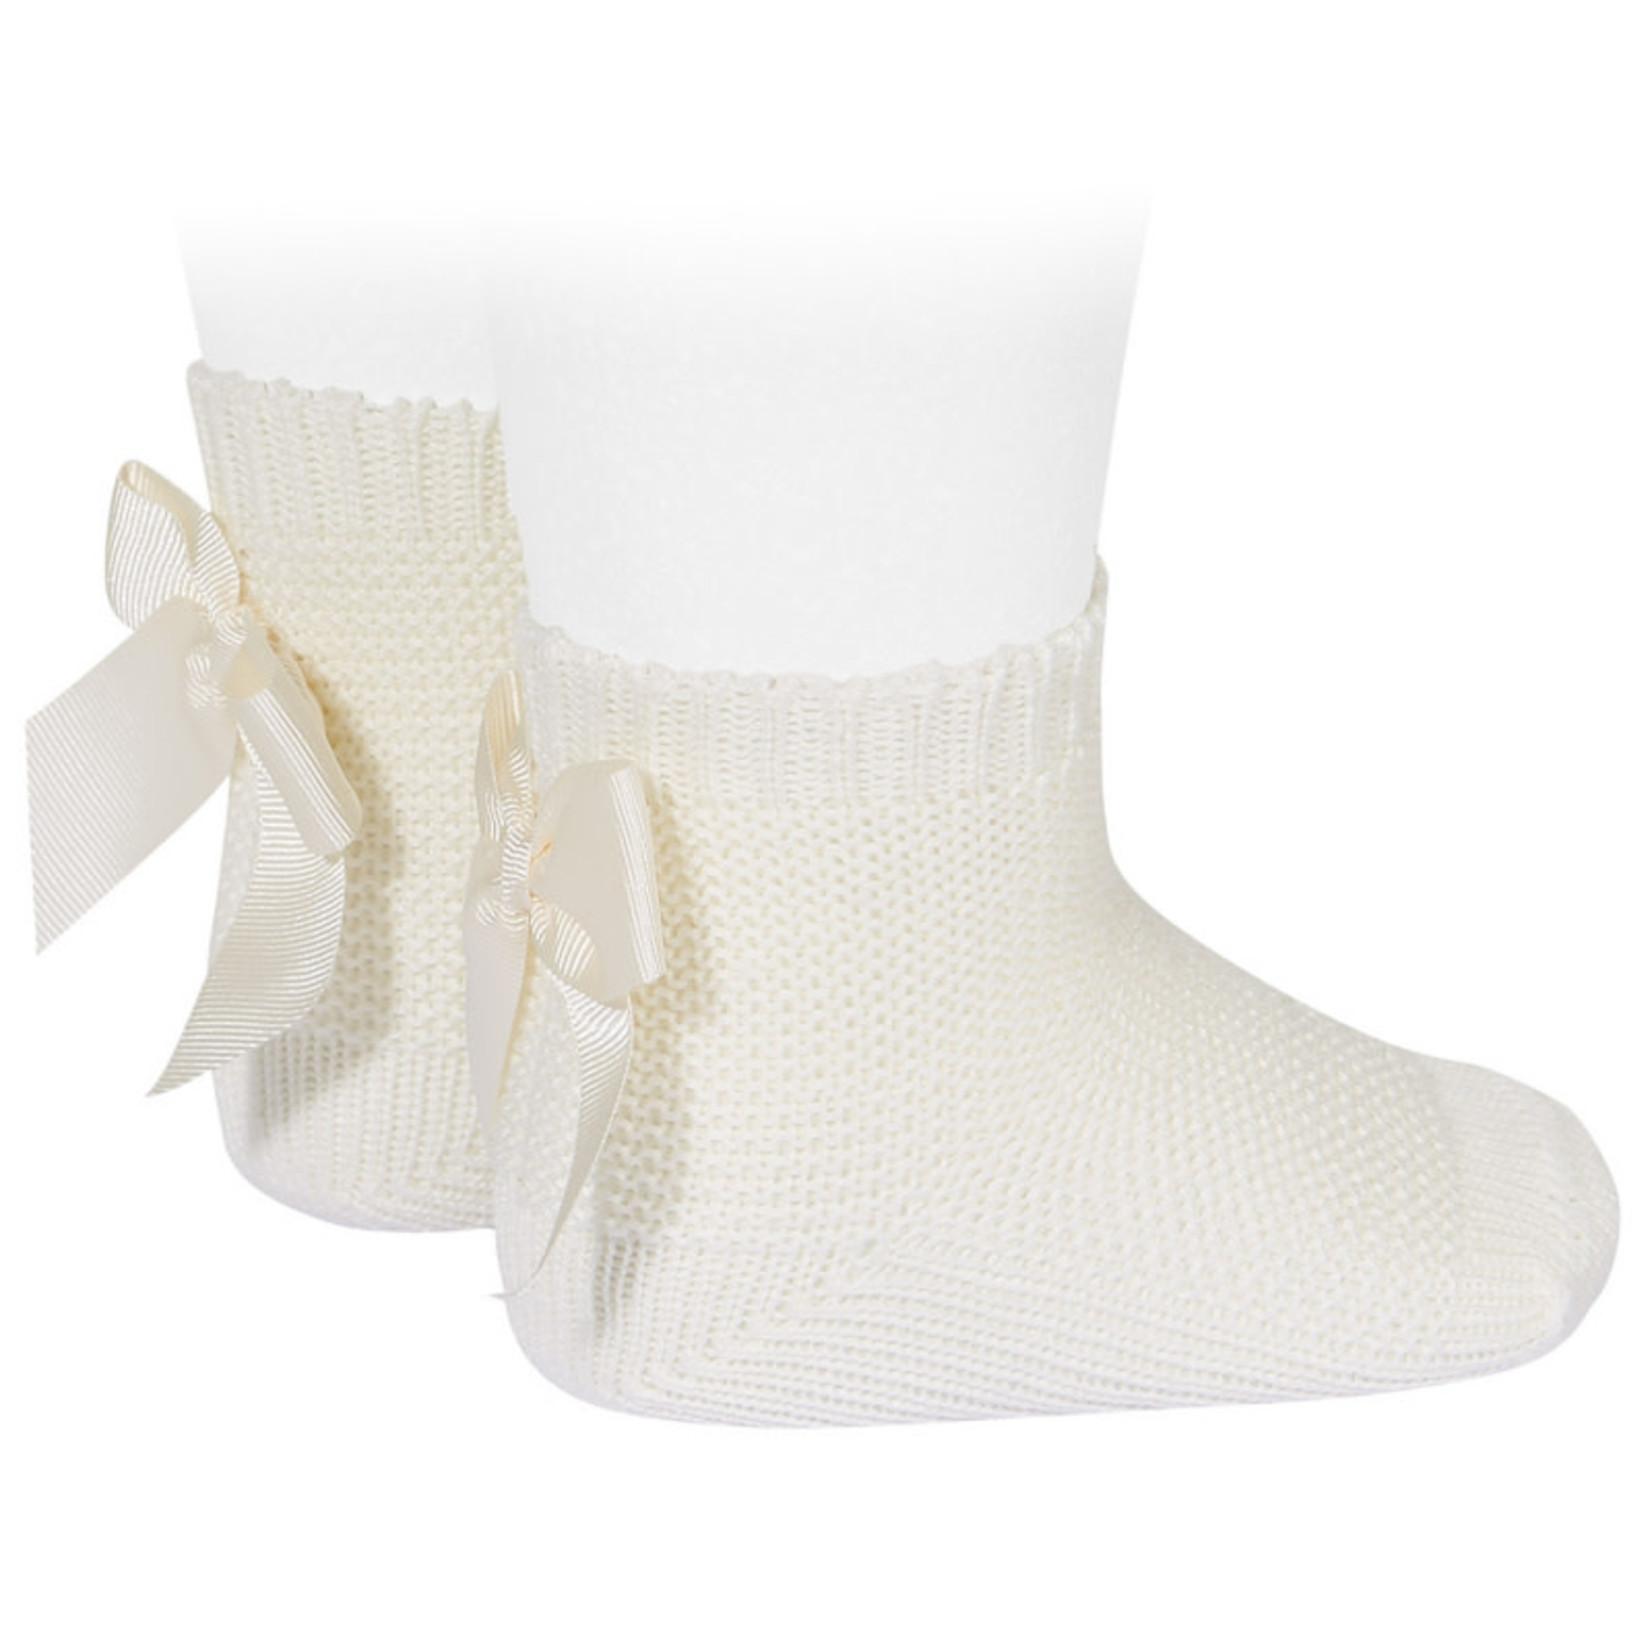 Condor Socks Open b/Bow - Creme